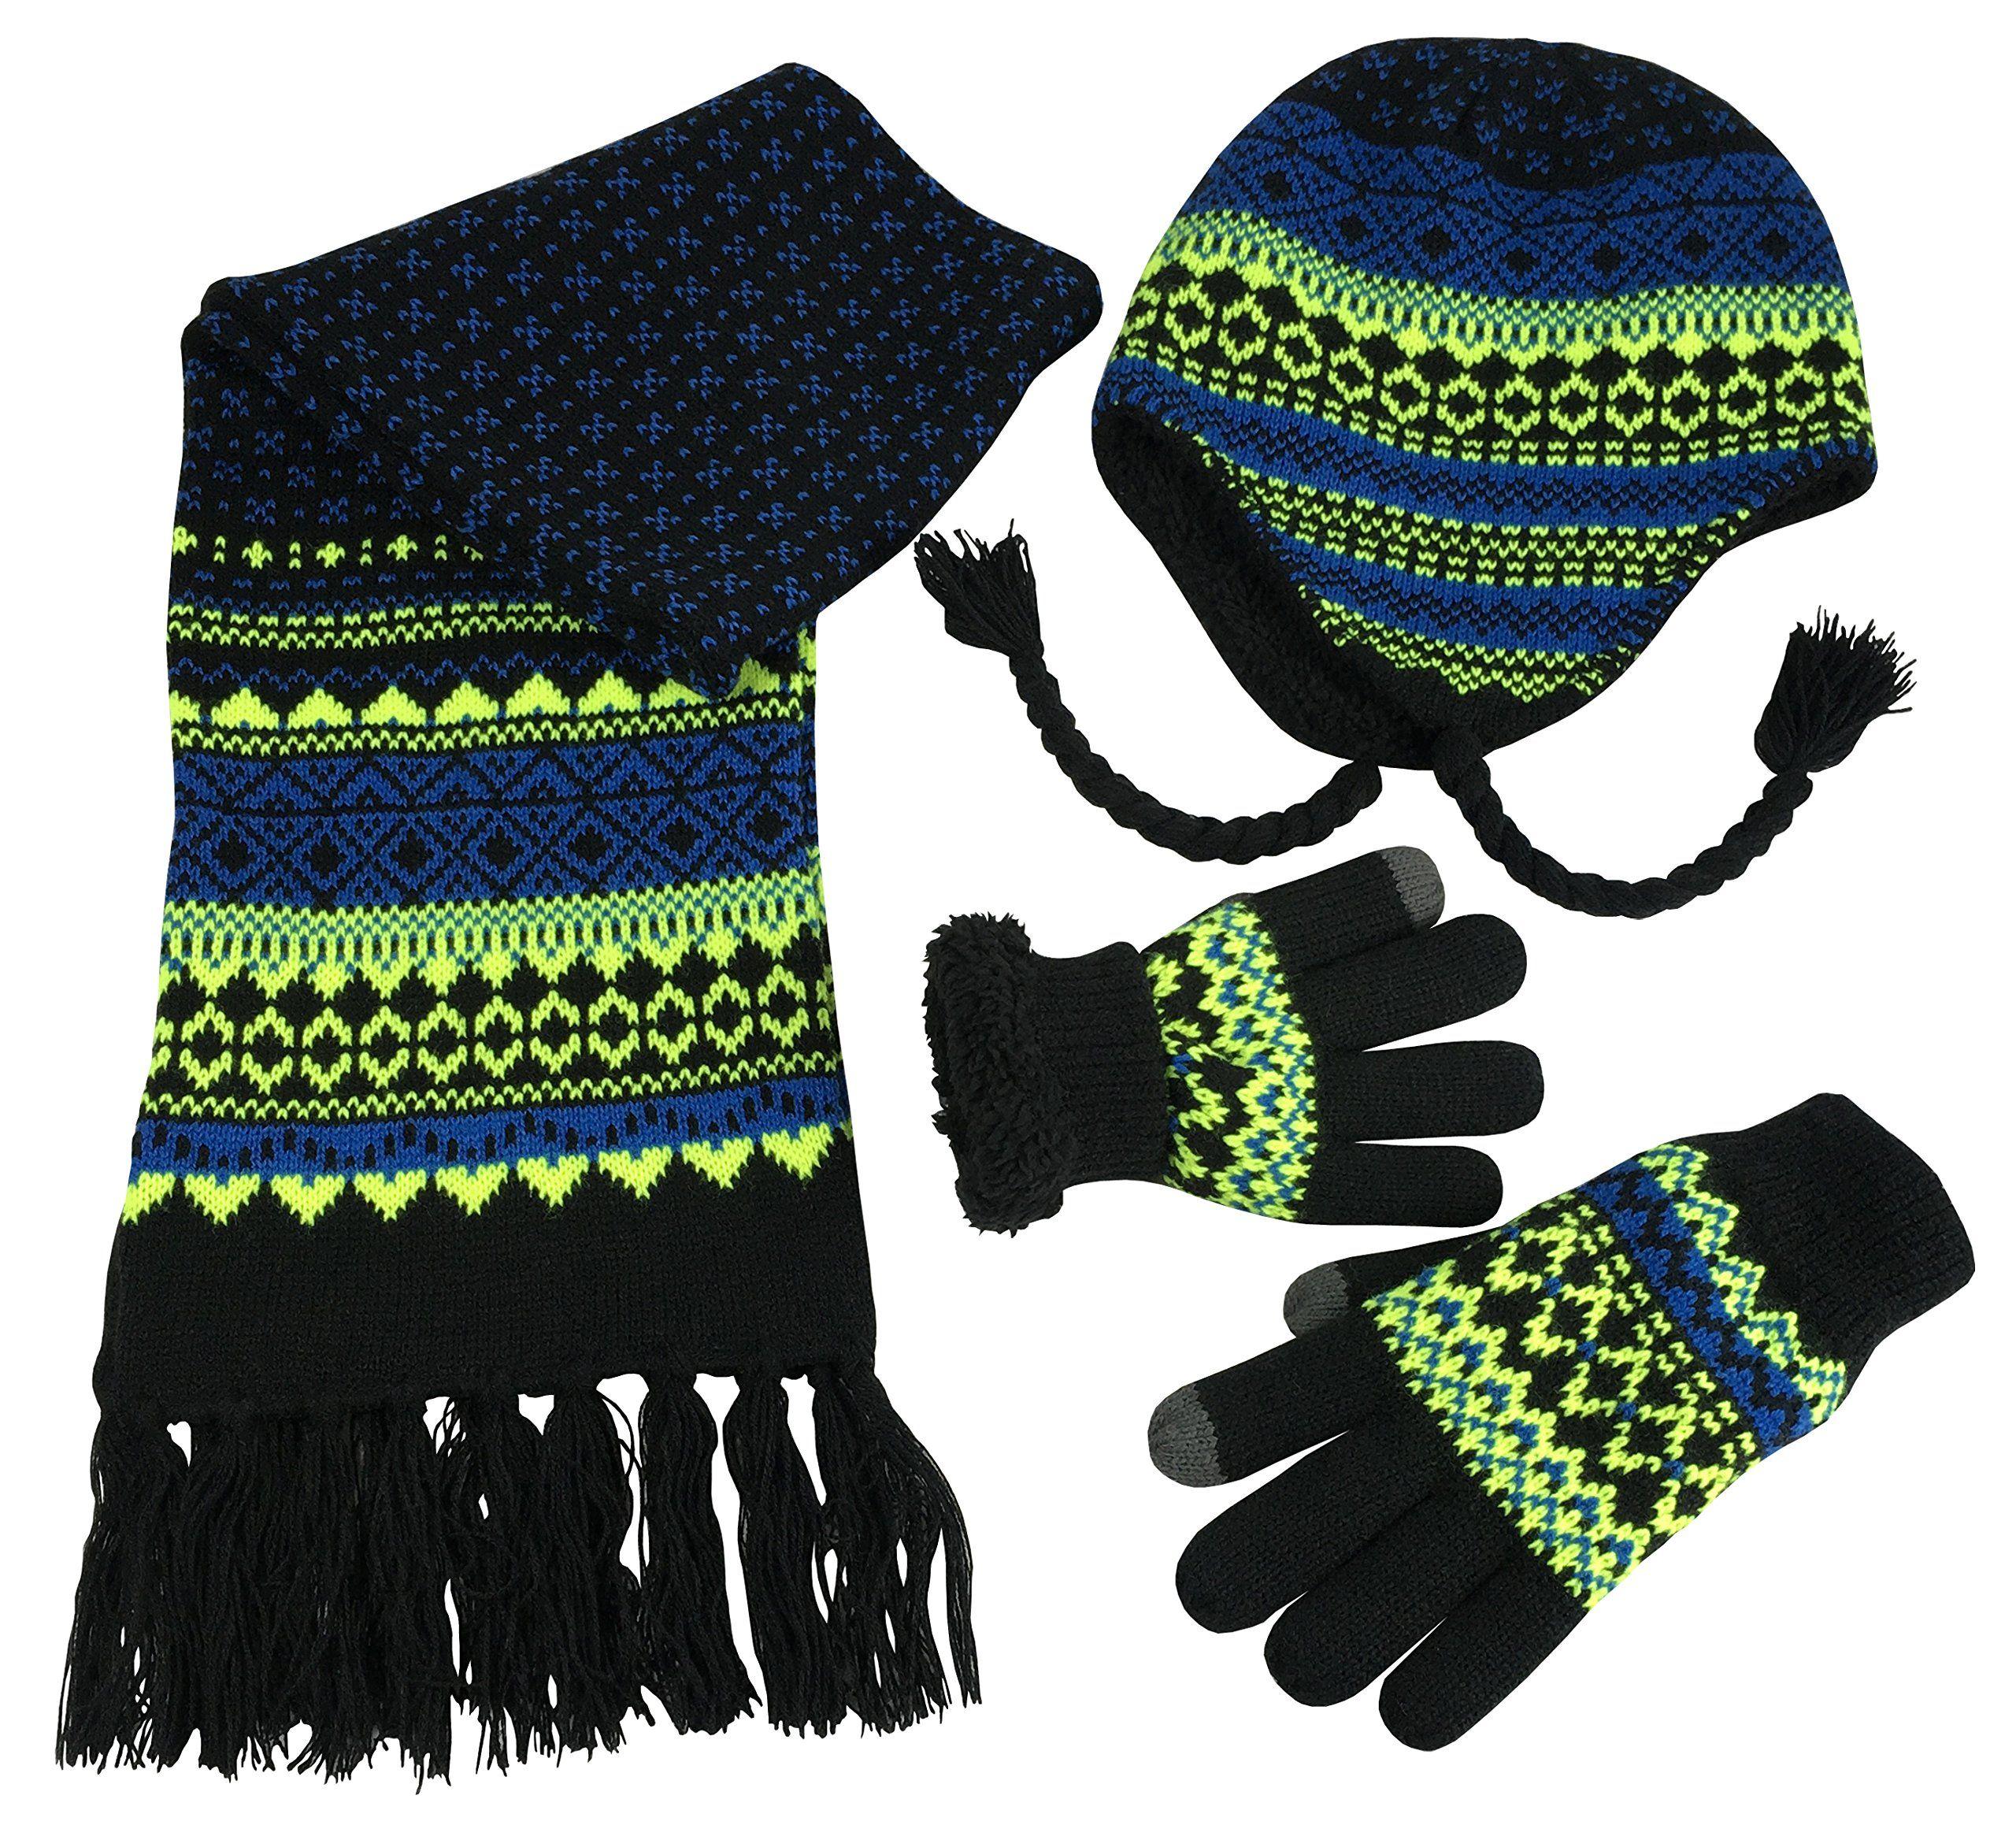 Scarf /& Gloves Set in 4 Fun Designs Polar Wear Boys 3 Piece Knit Hat